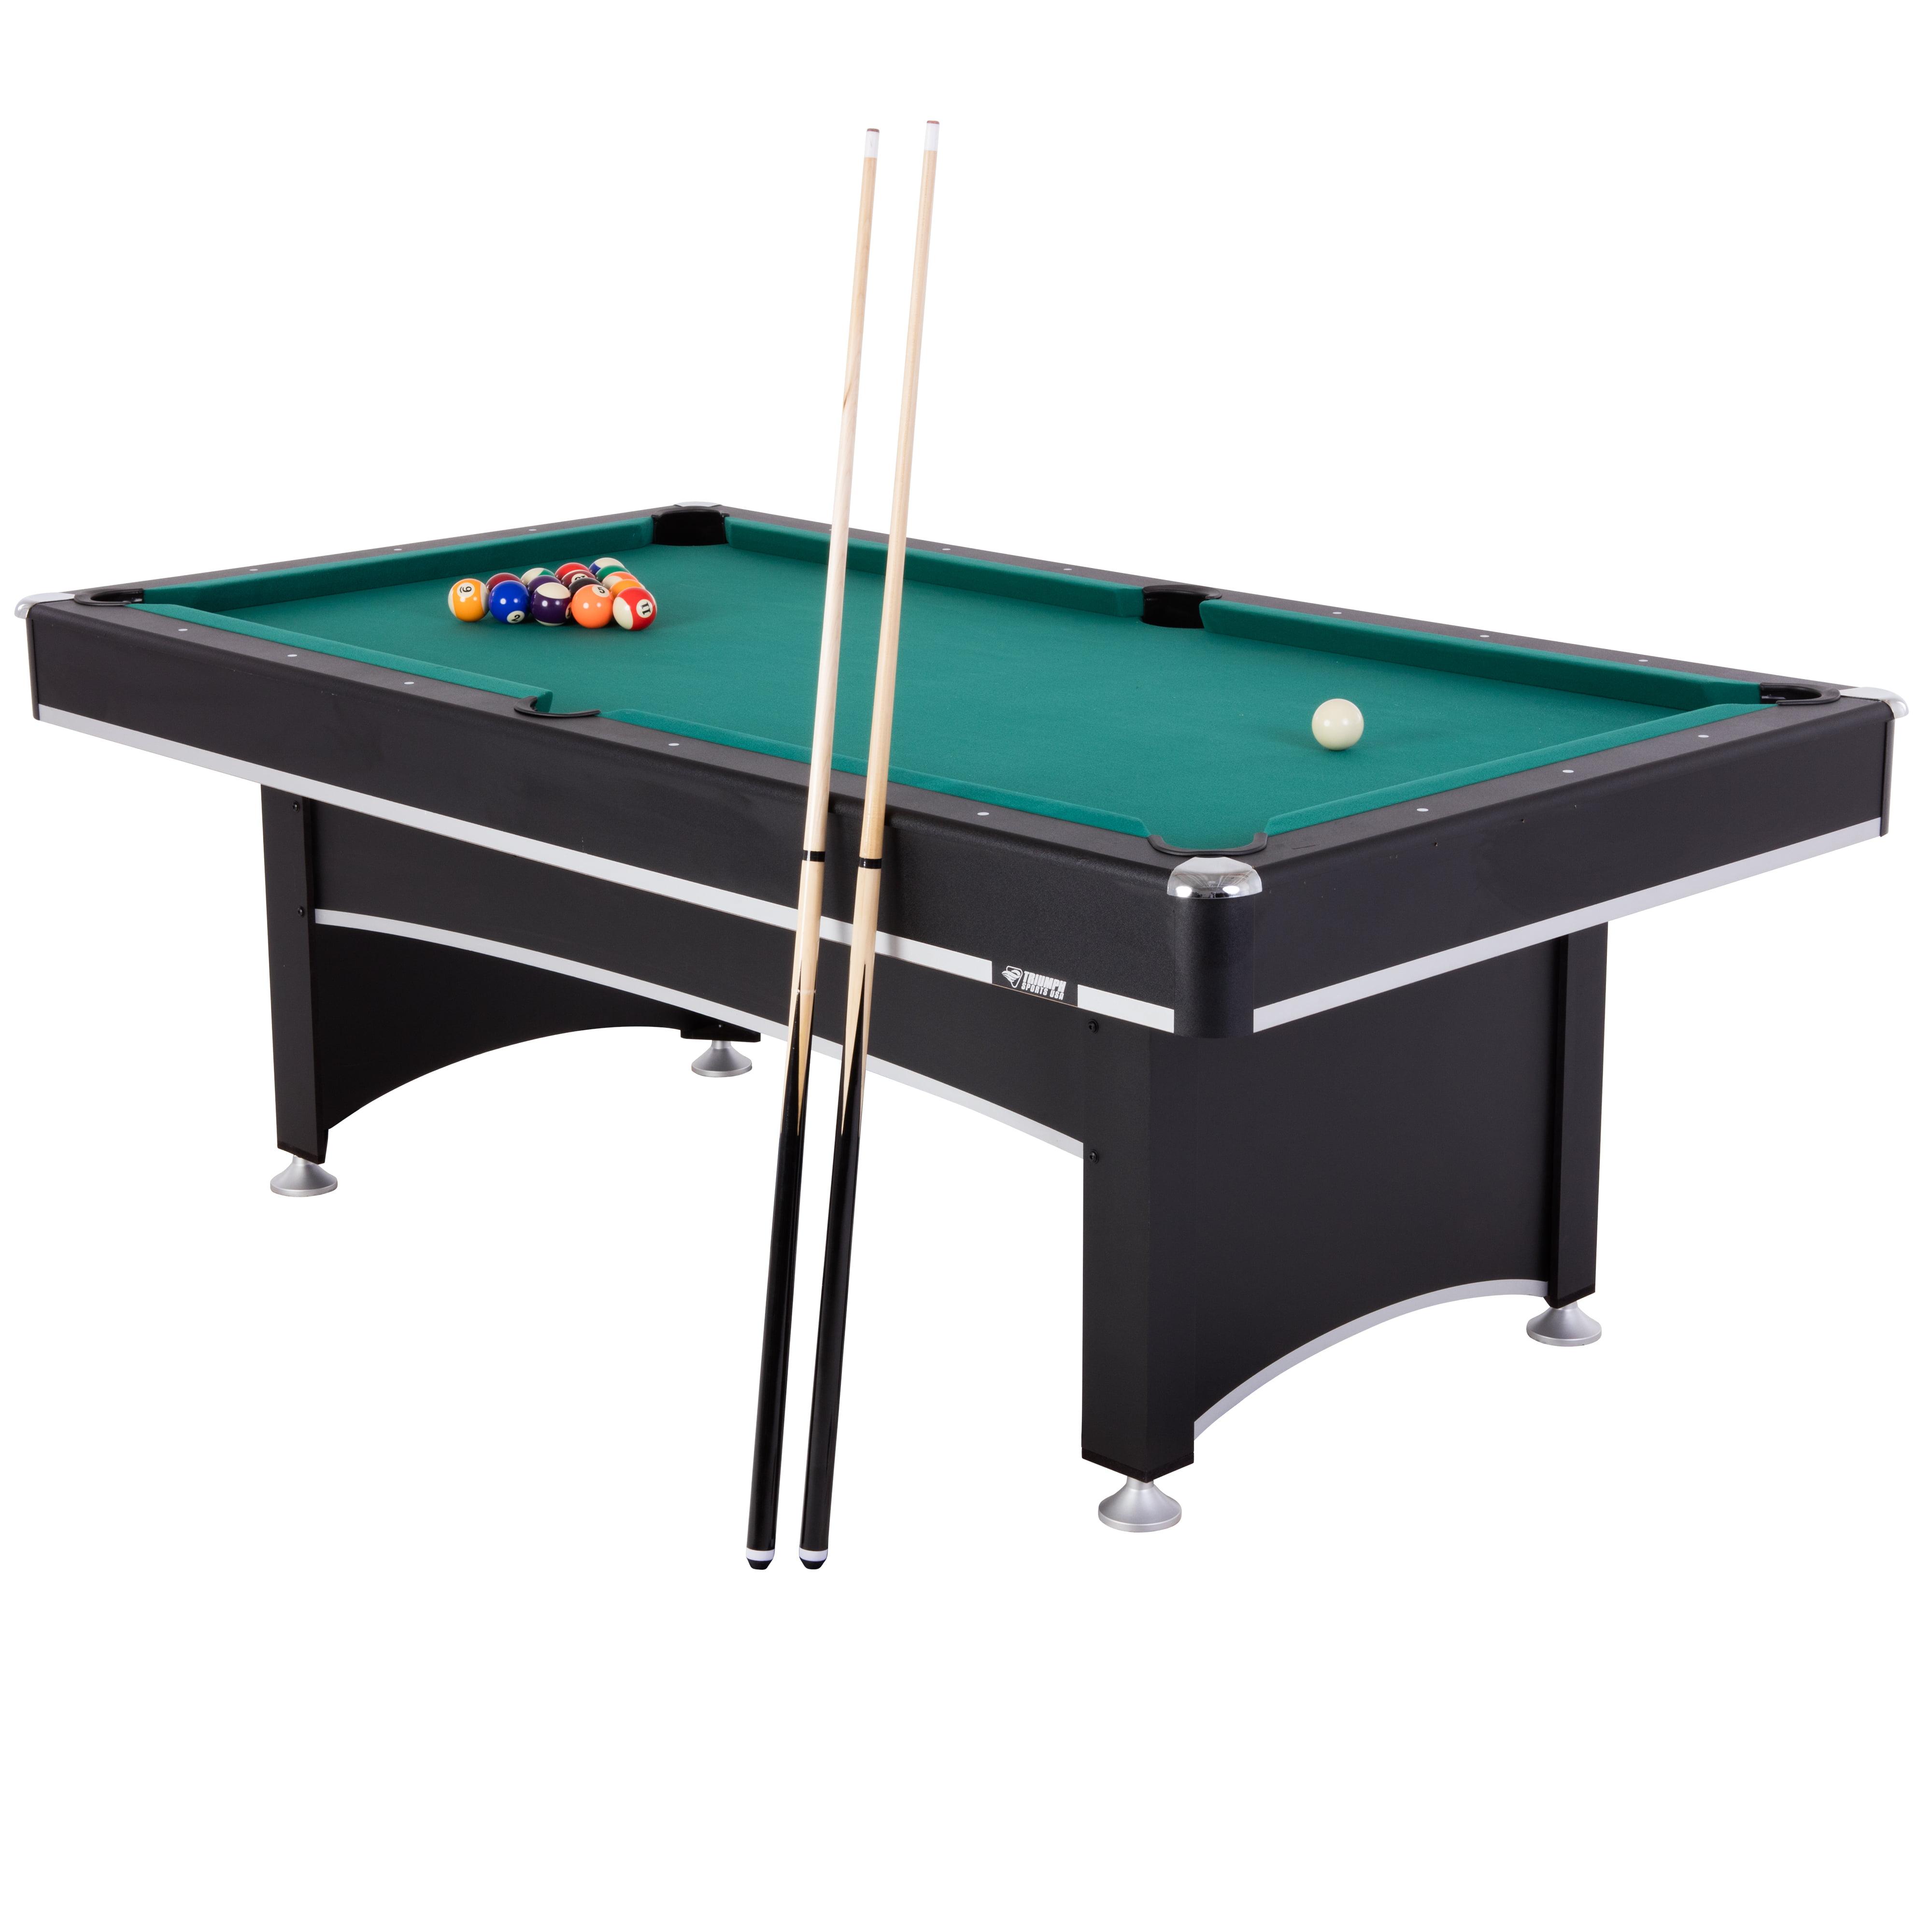 Triumph Phoenix Billiard Table With Tennis Top EBay - 84 pool table